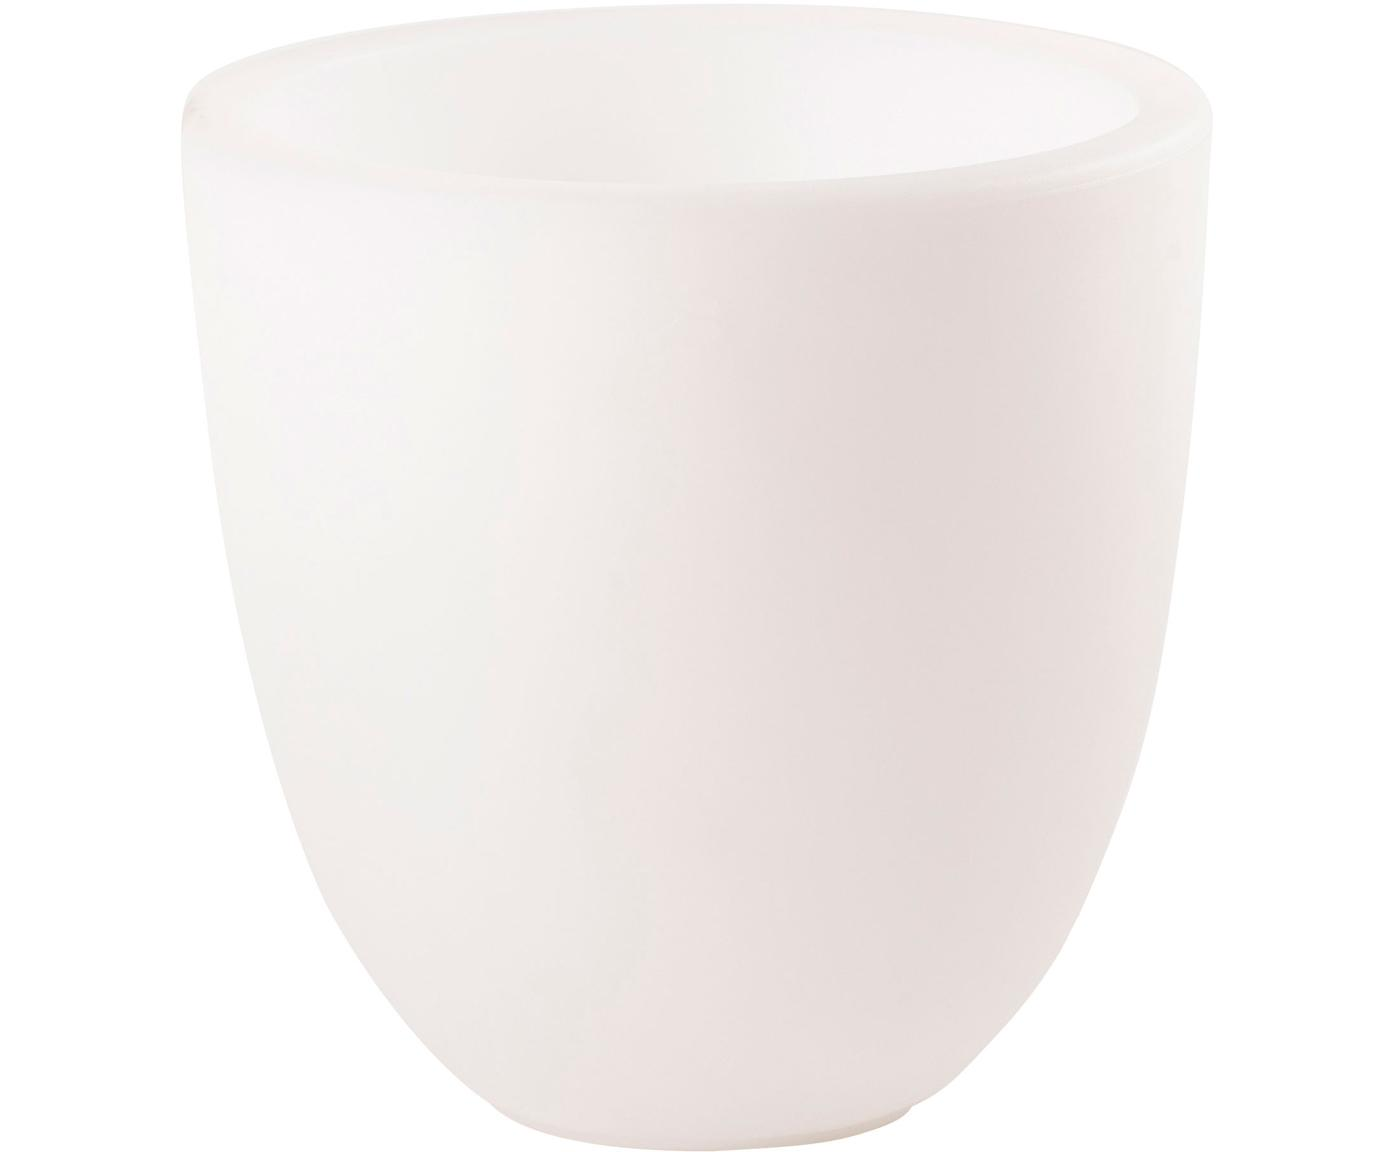 Mobiele outdoor lamp Shining Curvy Pot, Kunststof, Wit, Ø 39 x H 39 cm